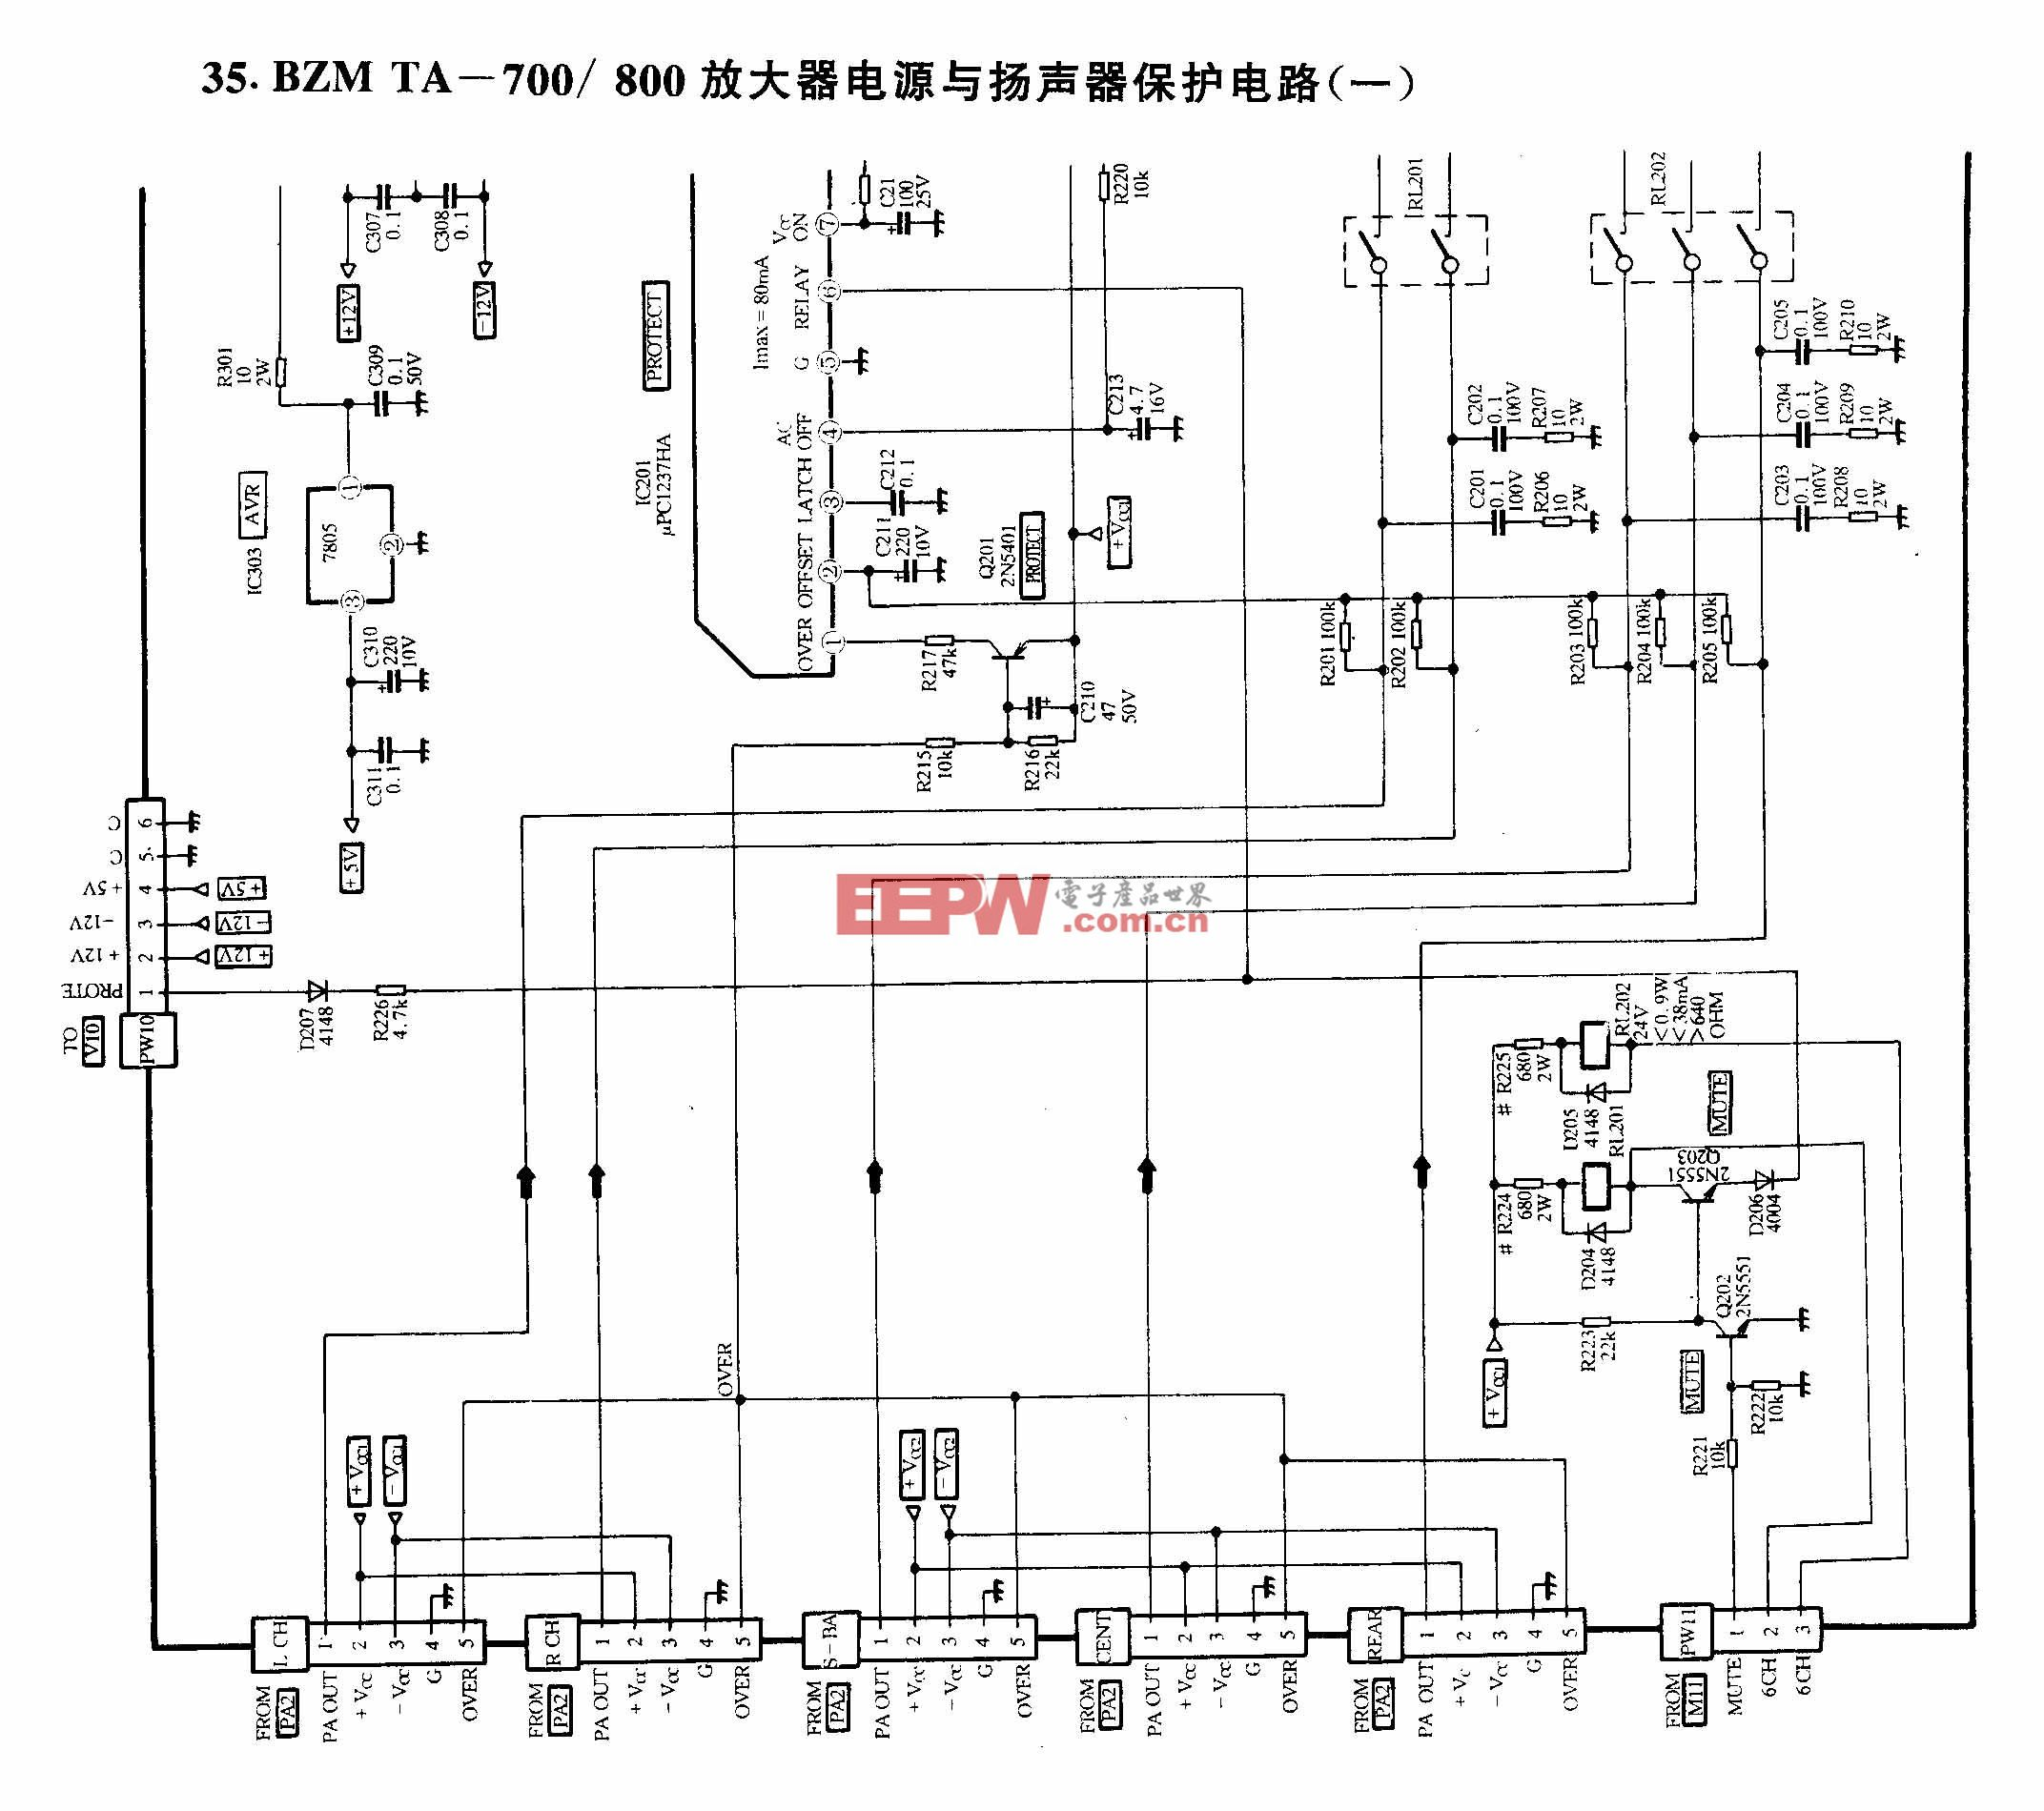 BZMTA-700/800放大器電源與揚聲器保護電路(一)